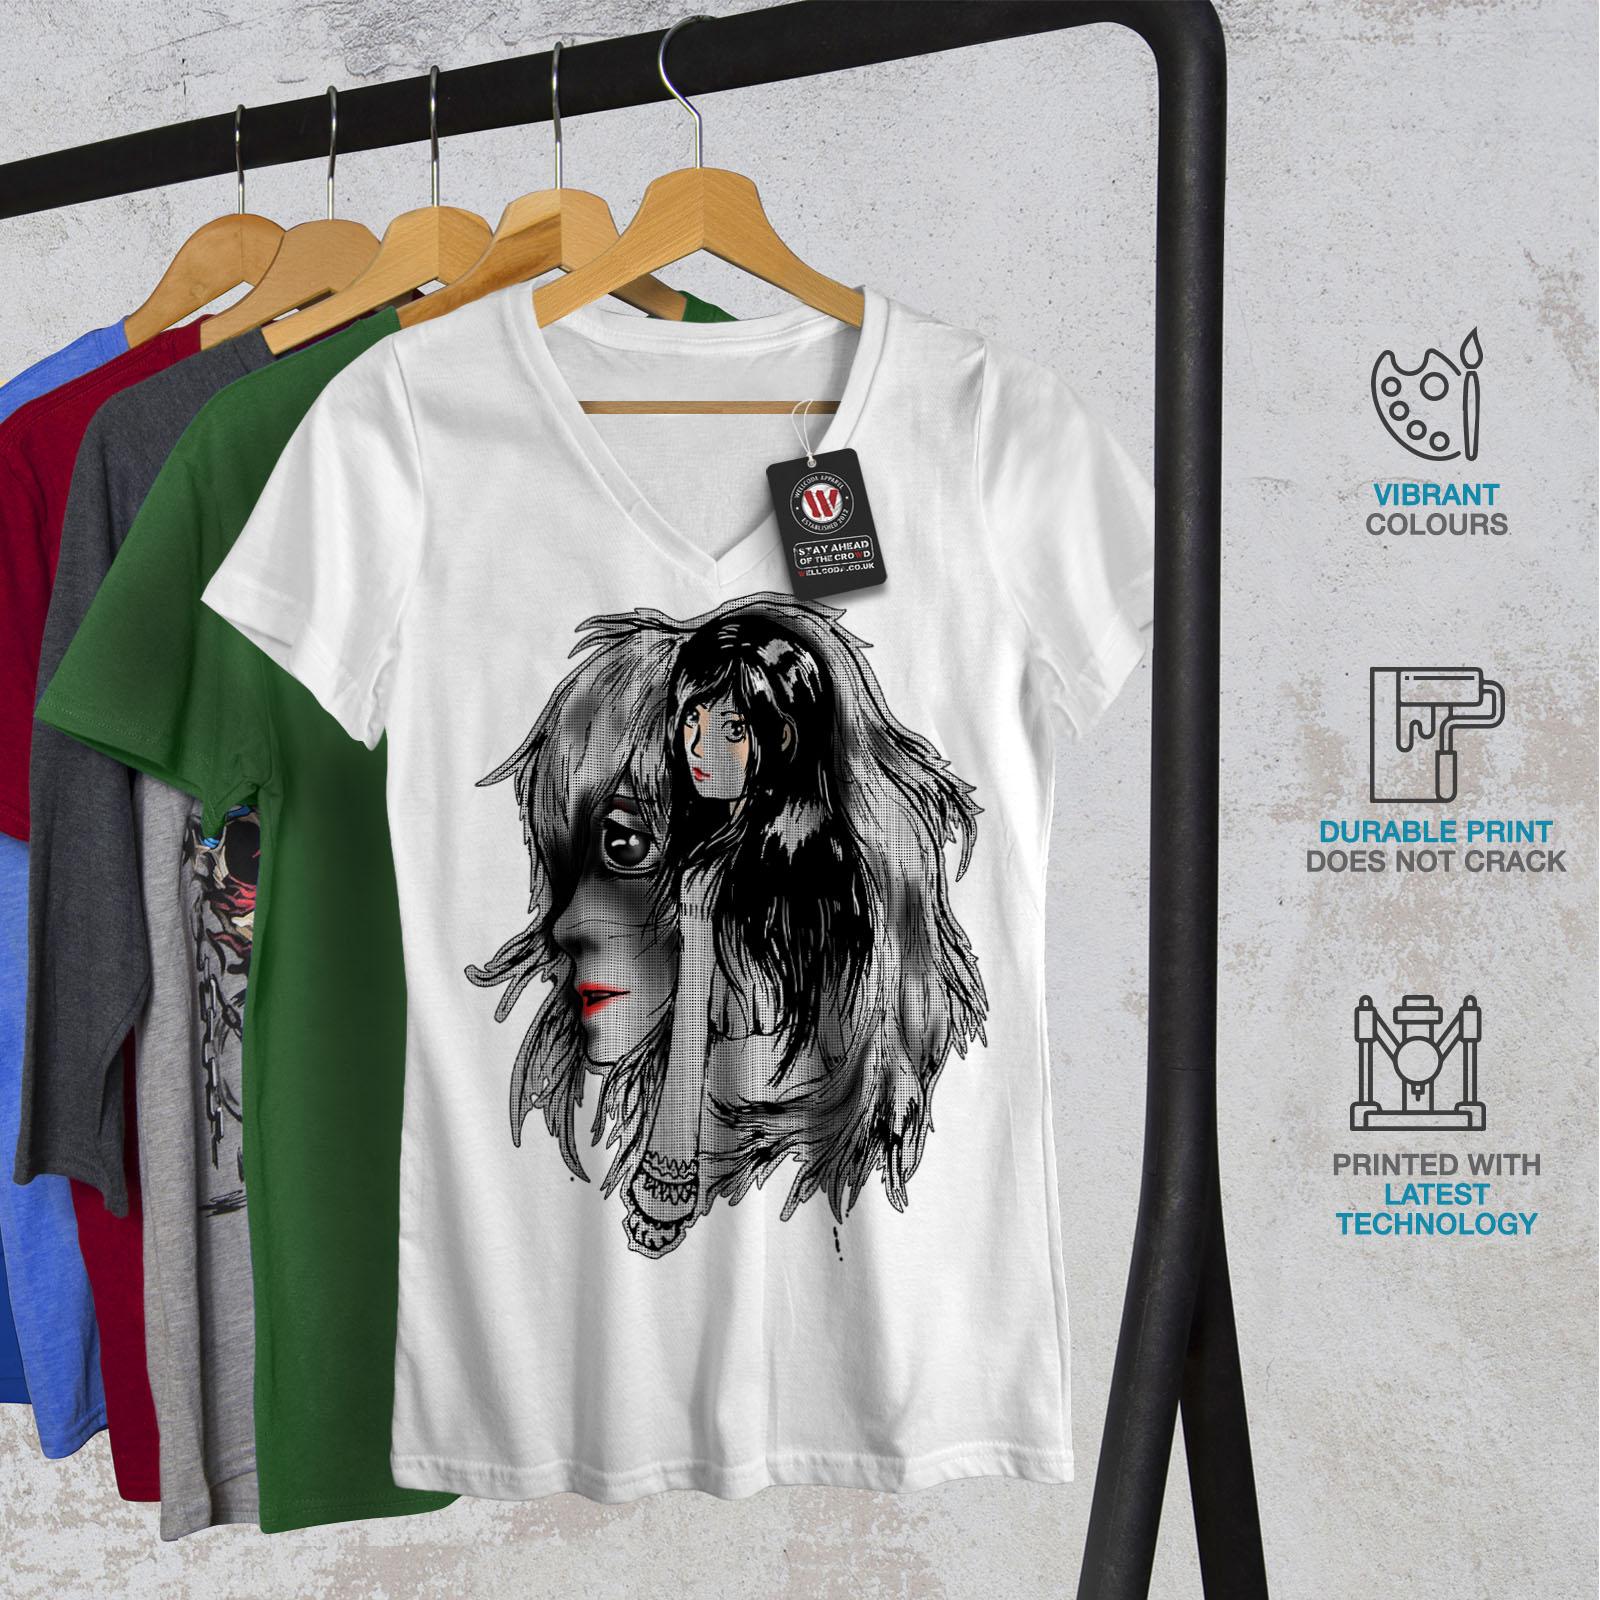 Wellcoda-BELLISSIMO-ANIME-Da-Donna-V-Neck-T-shirt-misterioso-Design-Grafico-Tee miniatura 8